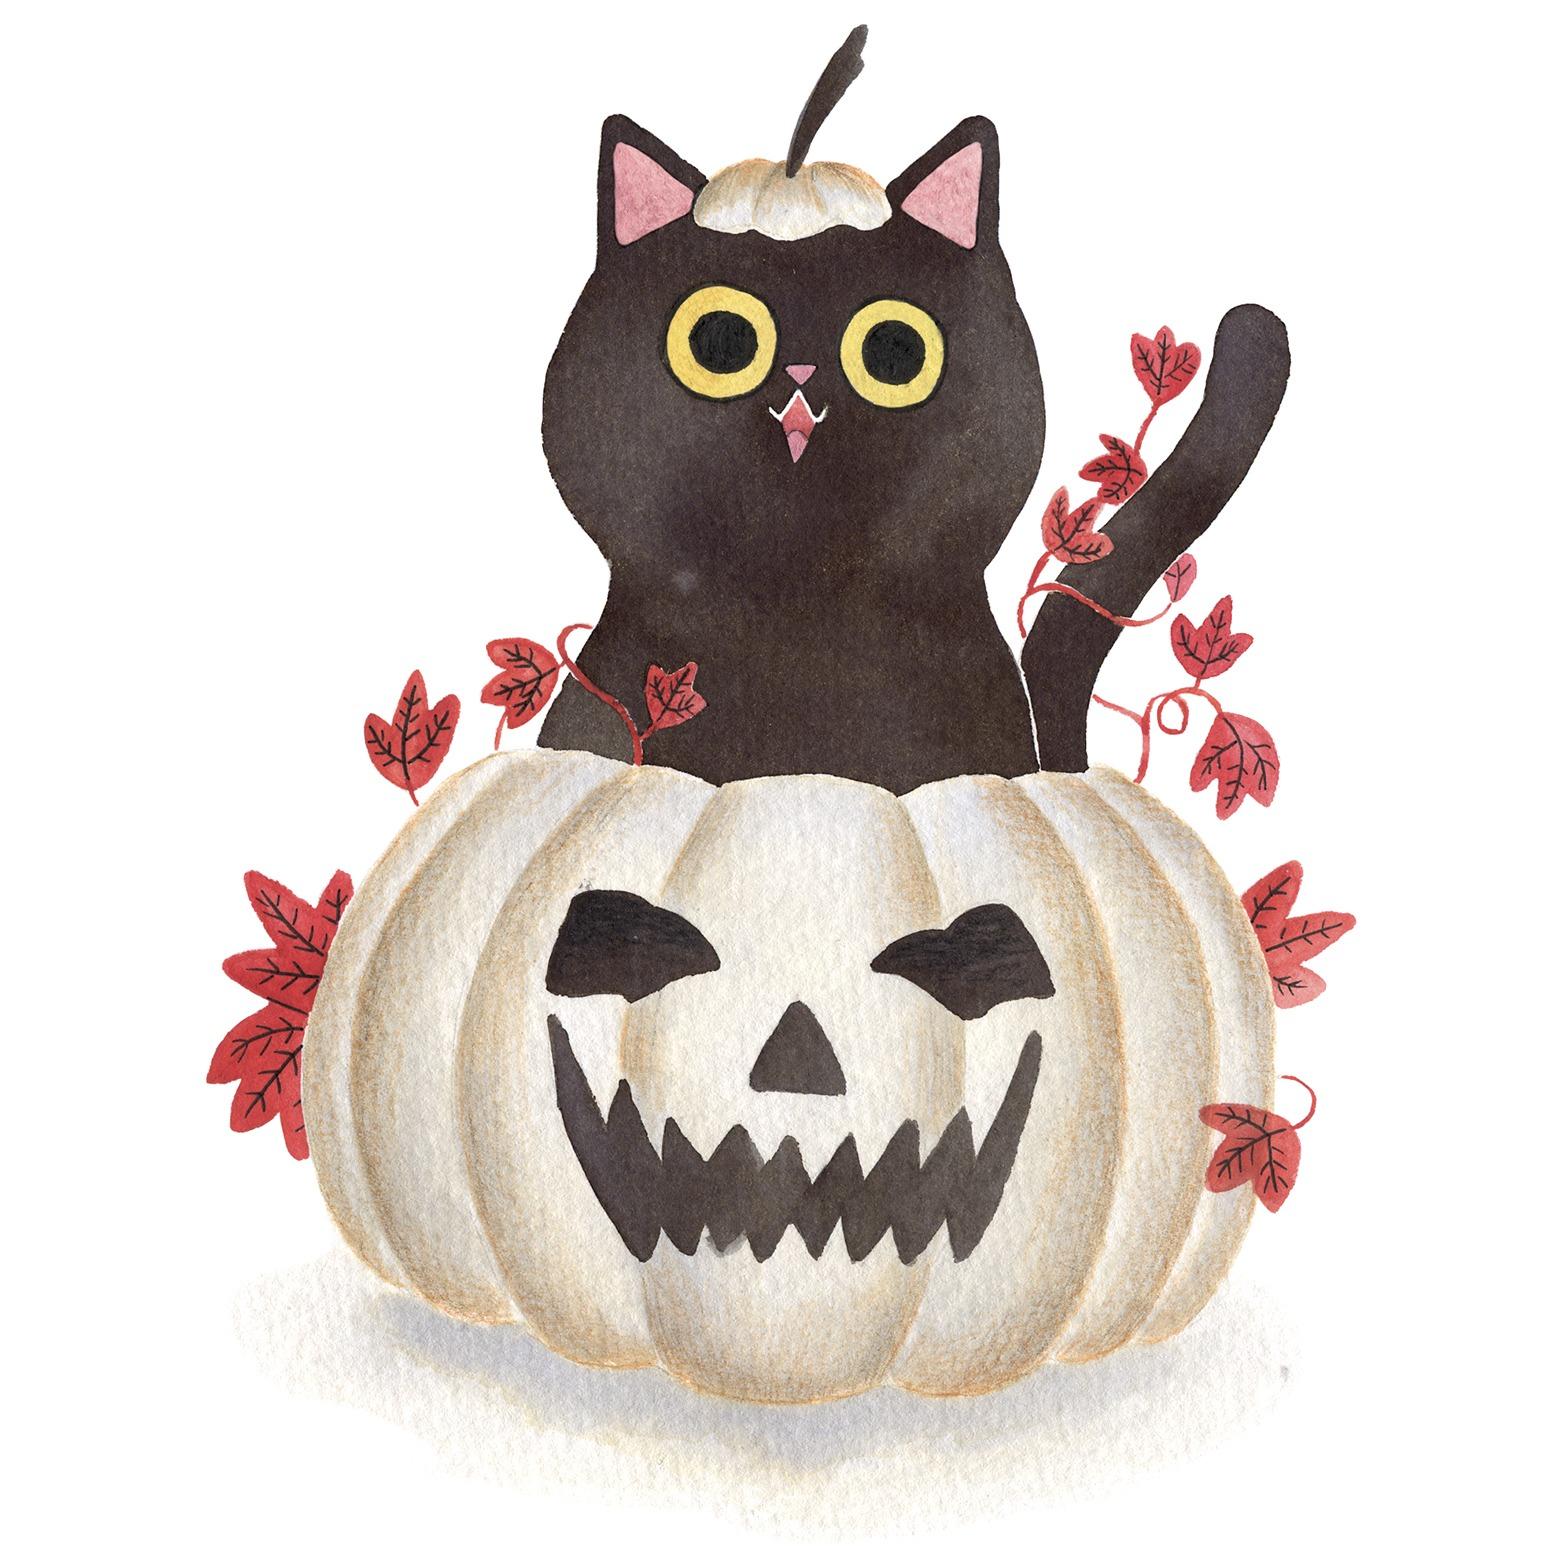 Ilustración de gato, Inktober, gato gordo, retrato de gato, gato halloween, calabaza de halloween,